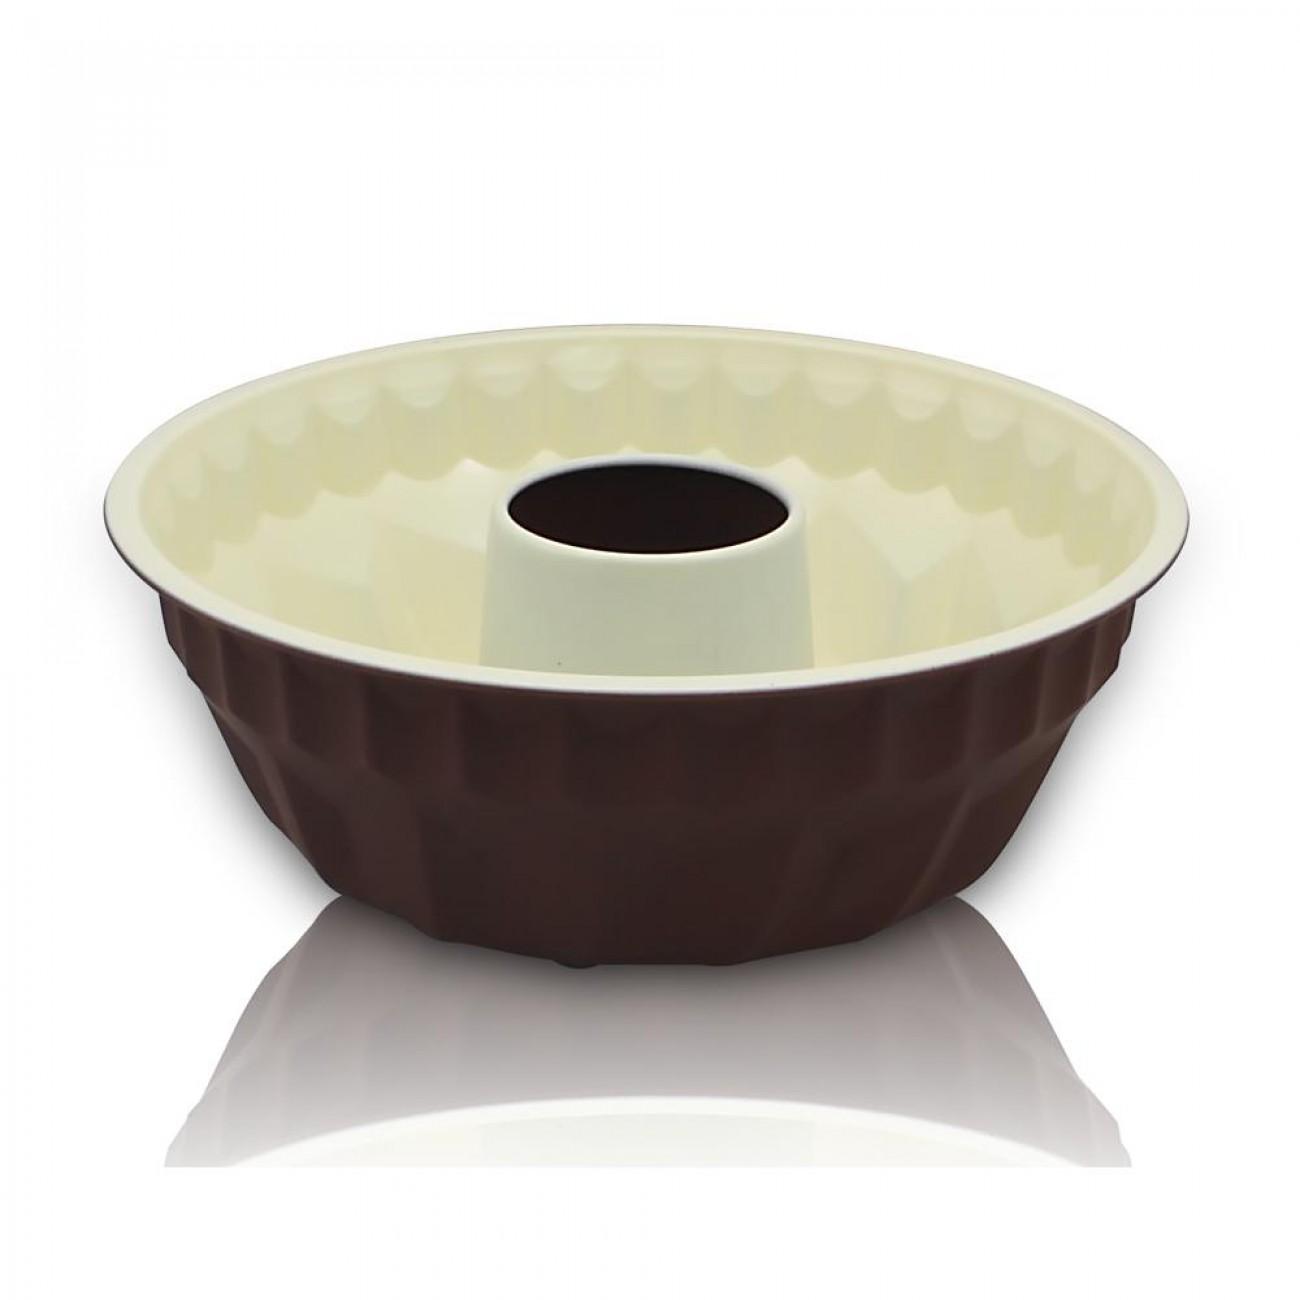 Форма за кекс SAPIR SP 1223 DC2, 21.5 см, Керамика, Незалепващо покритие в Форми за сладкиши - SAPIR   Alleop